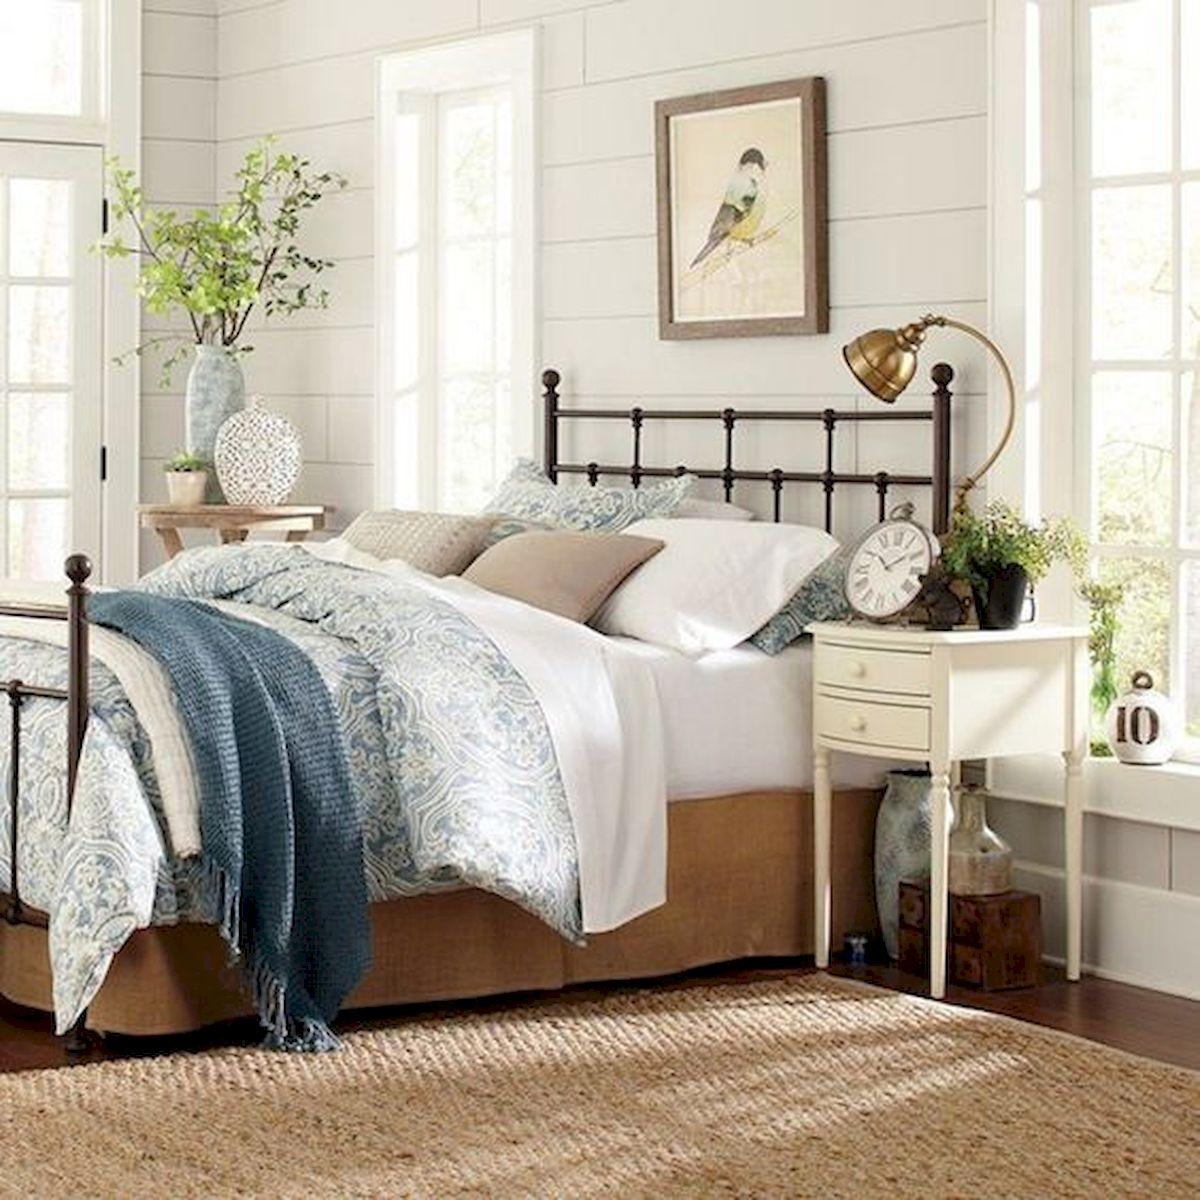 40 Fantastic DIY Decor Ideas For Farmhouse Boho Bedroom Design (33)